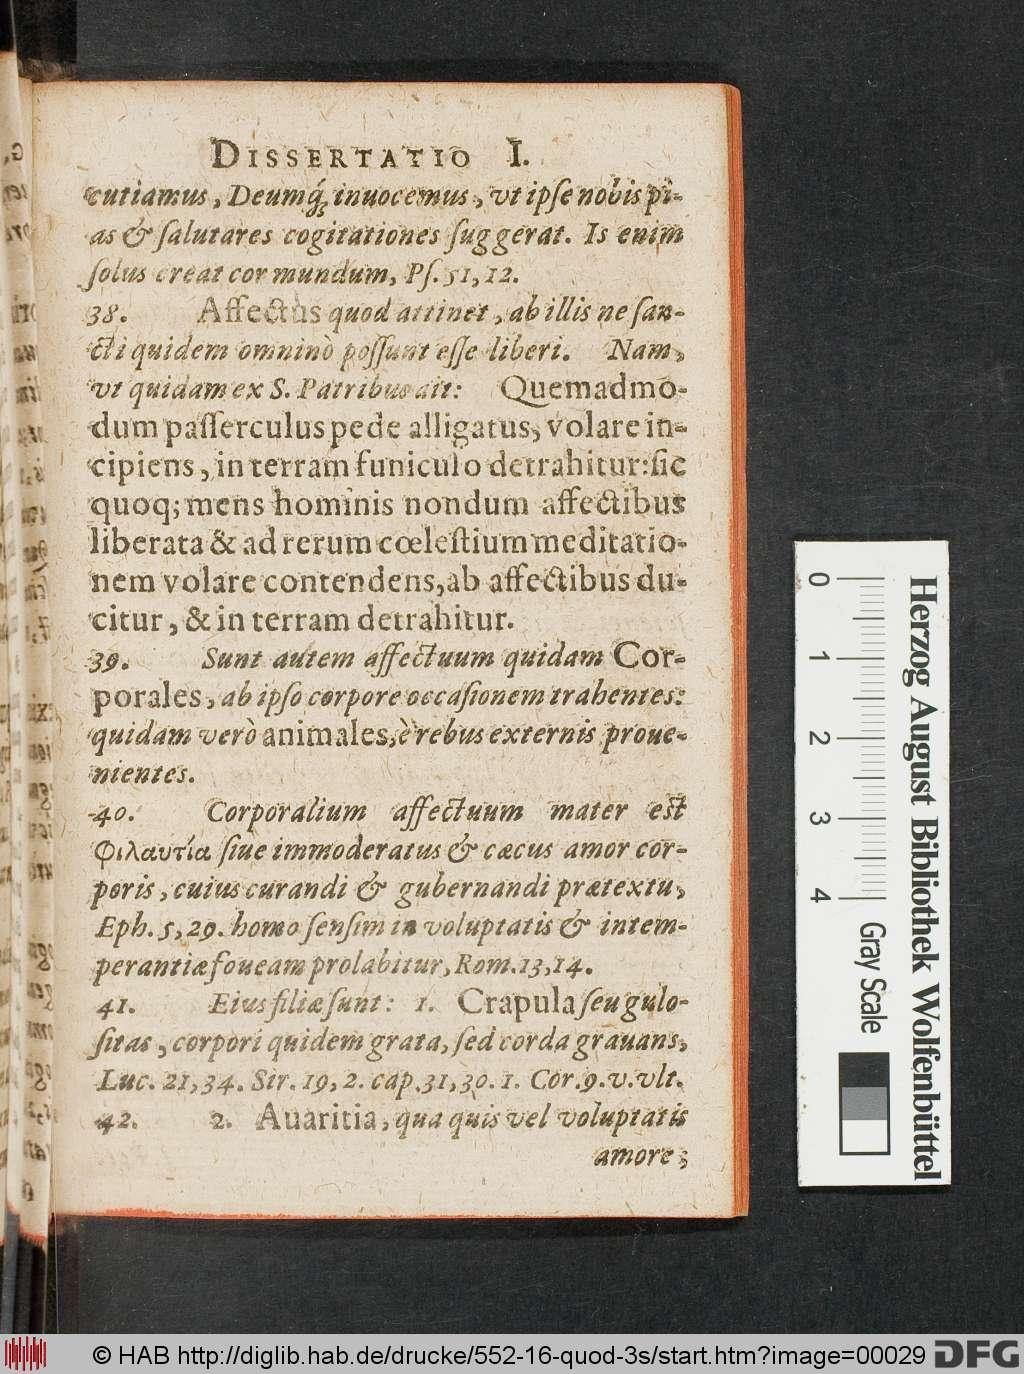 http://diglib.hab.de/drucke/552-16-quod-3s/00029.jpg